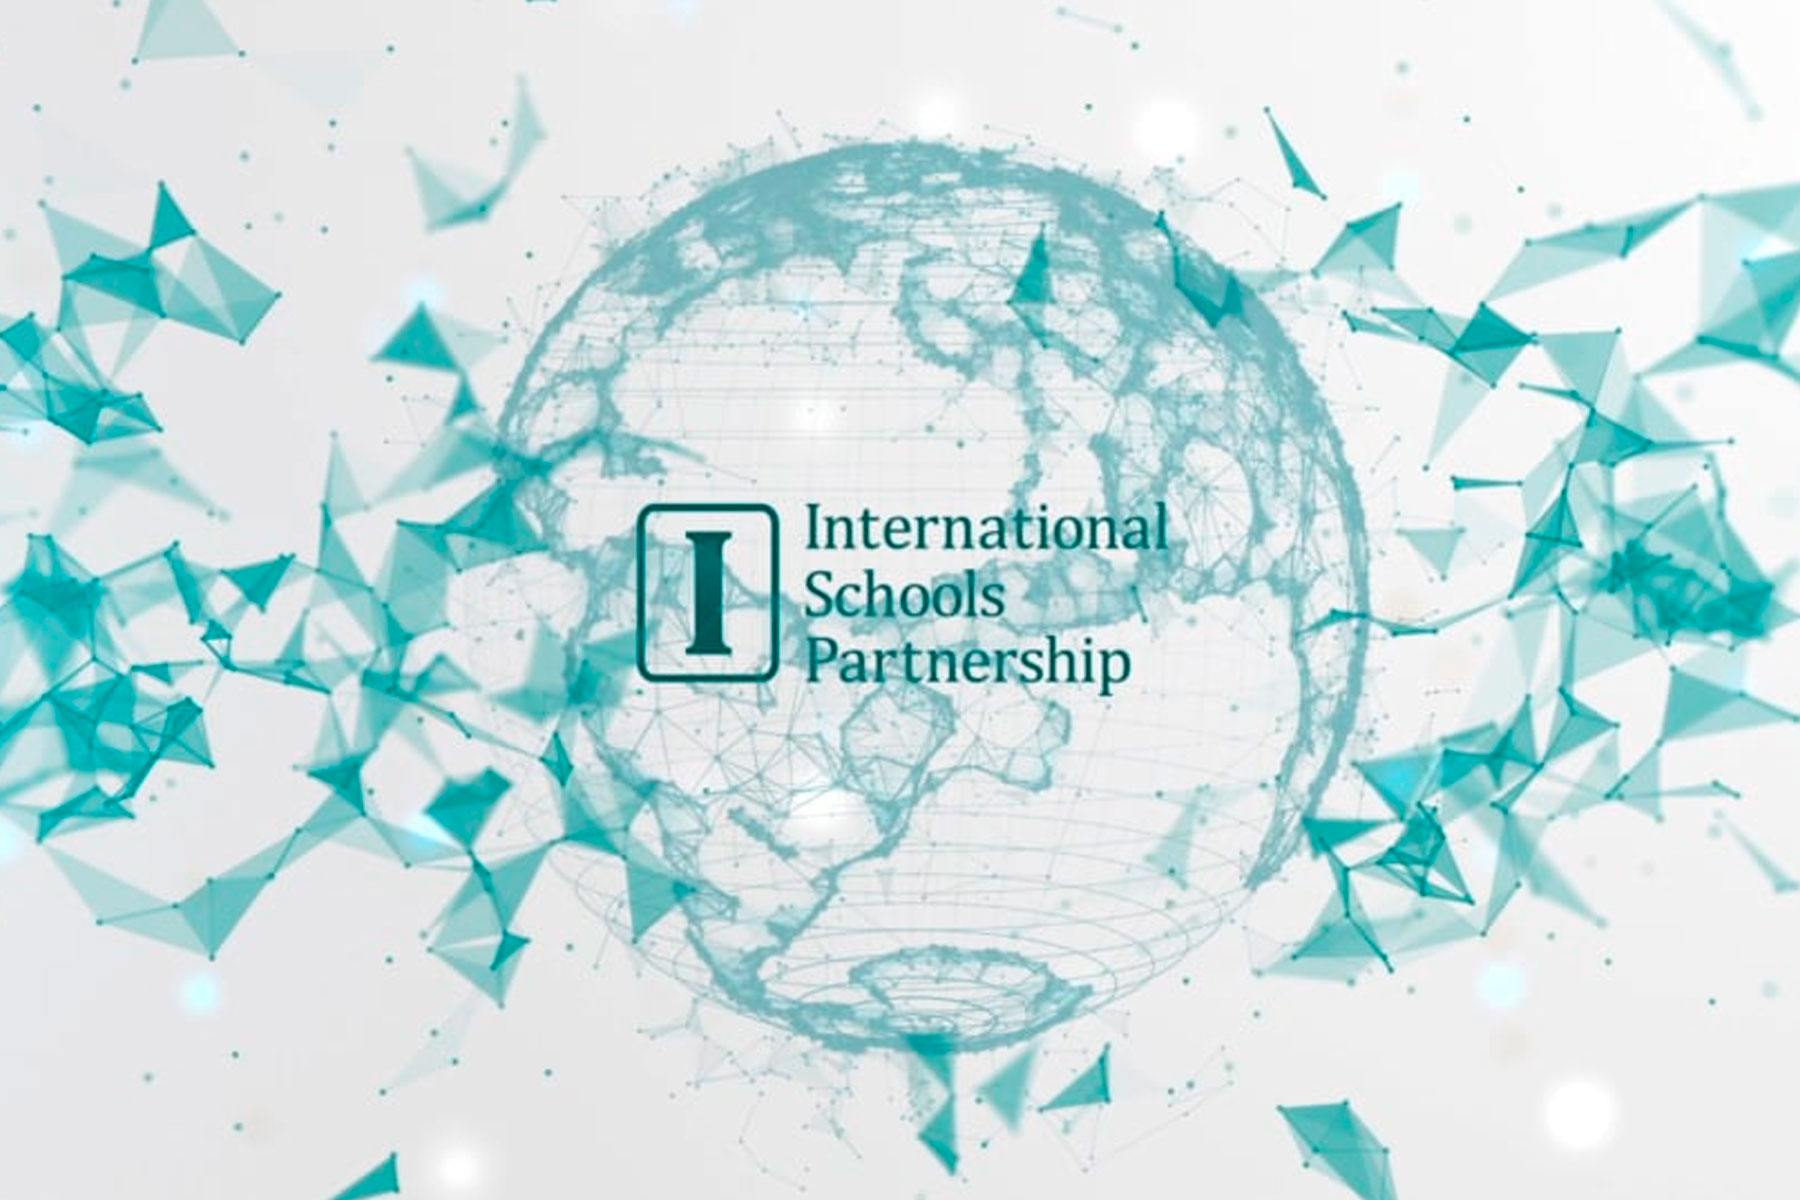 International School Partnership